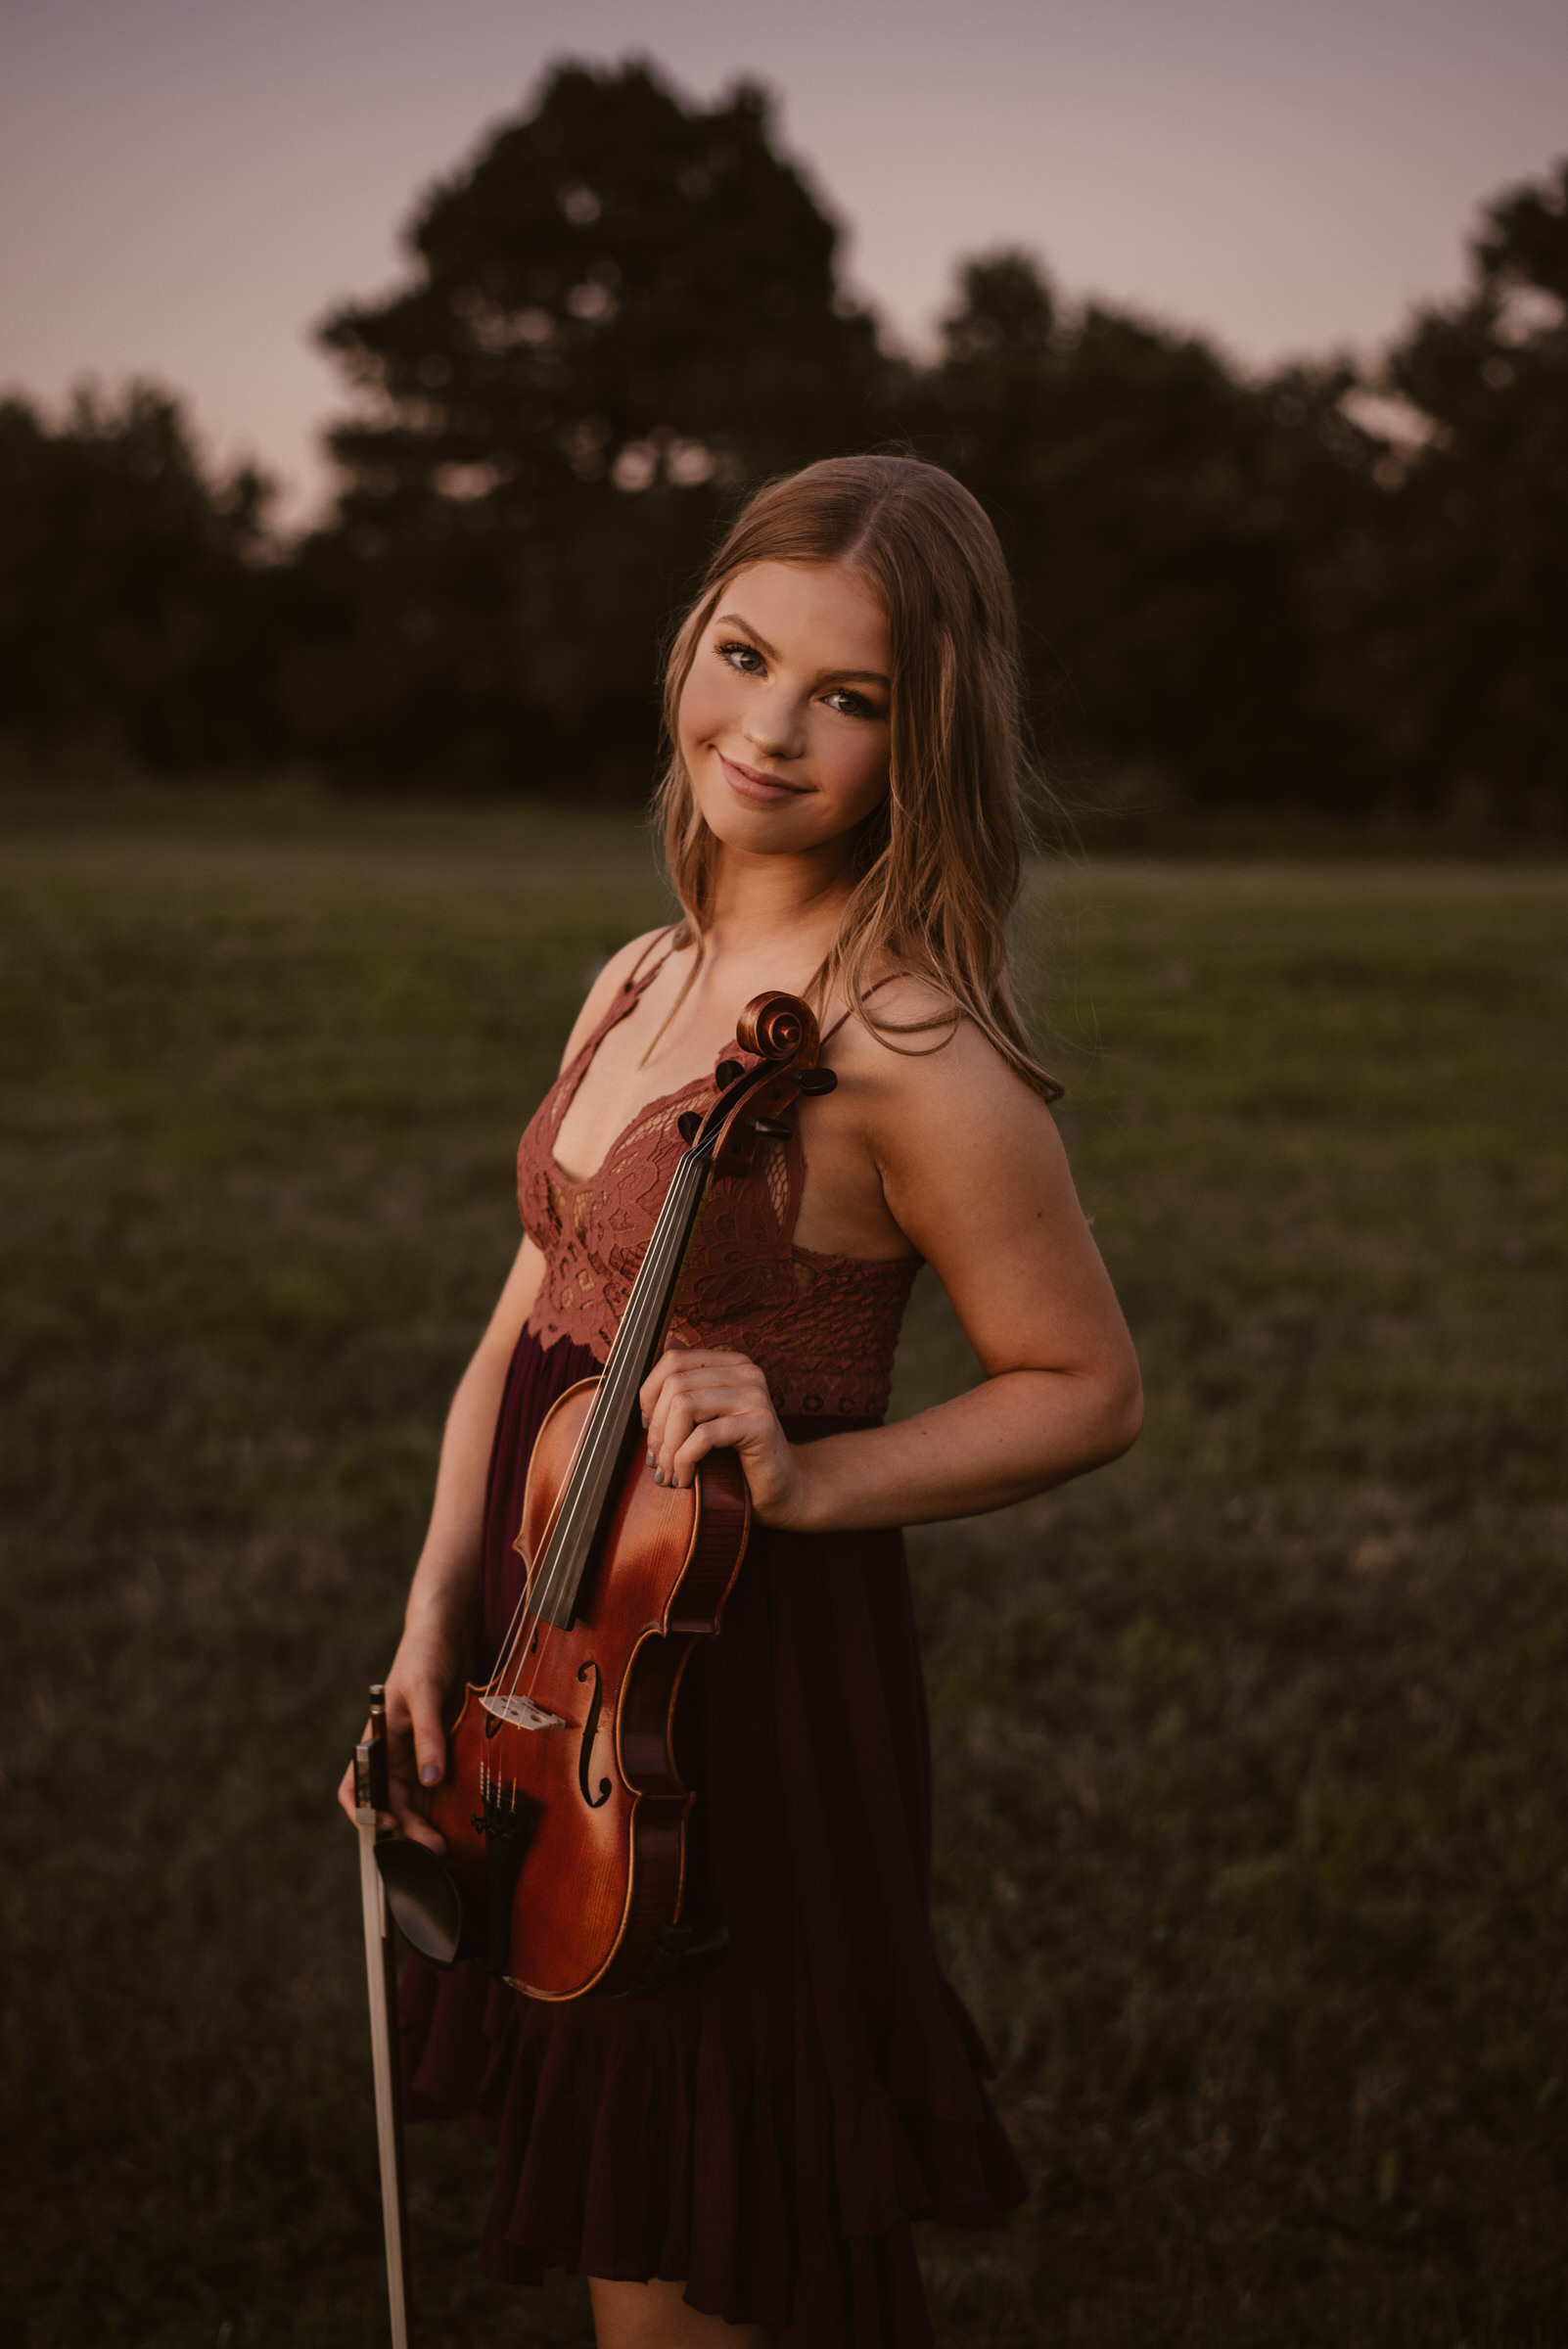 Kaylie-Sirek-Photography-Lincoln-Nebraska-Senior-039.jpg